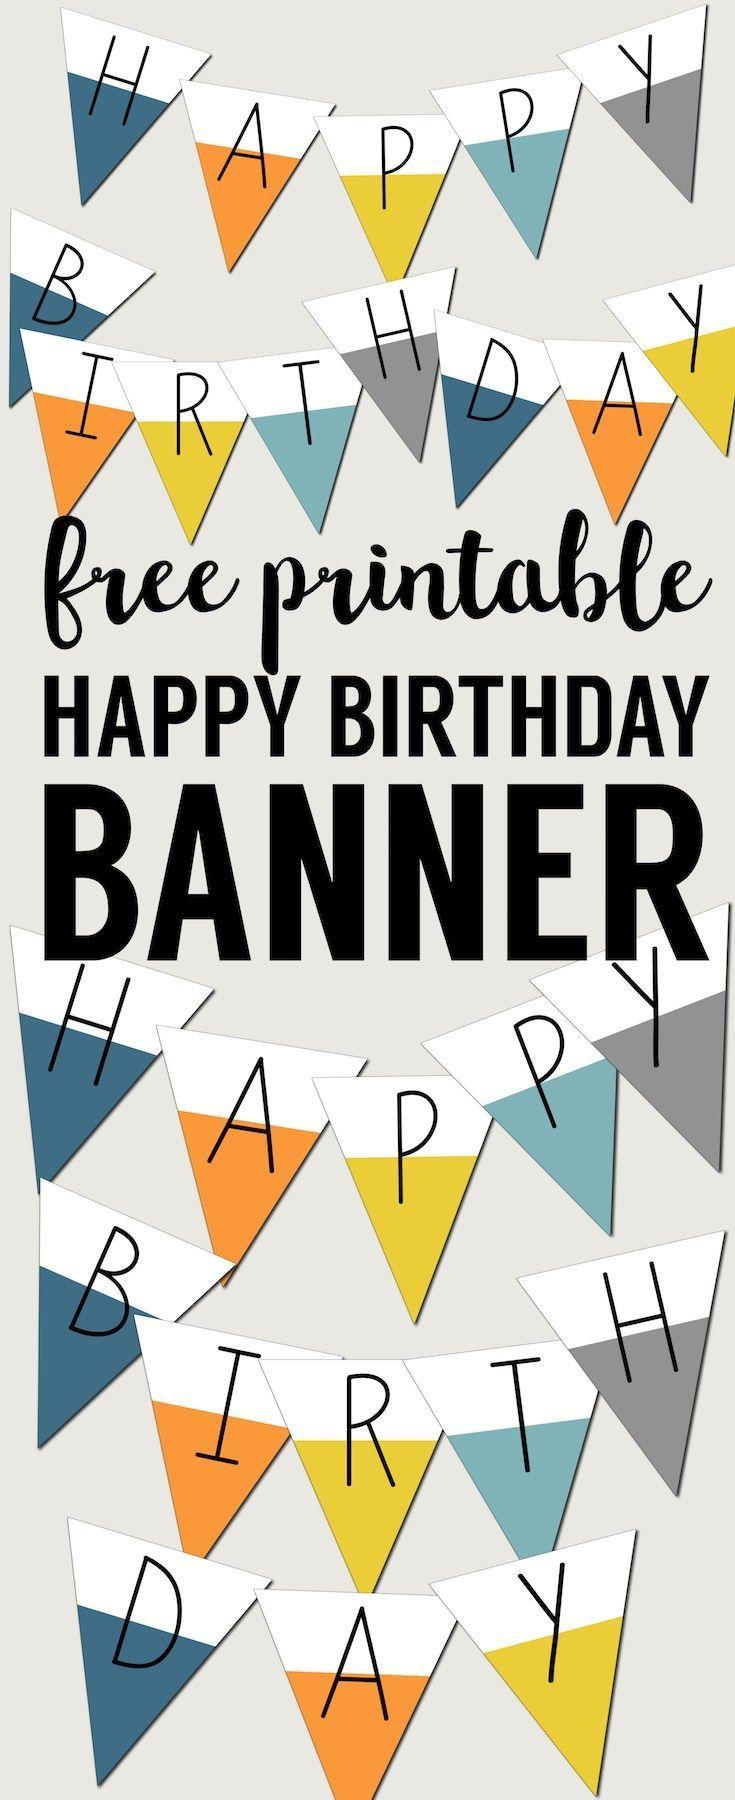 Free Printable Happy Birthday Banner Paper Trail Design Diy Birthday Banner Happy Birthday Banner Printable Free Birthday Banner Free Printable